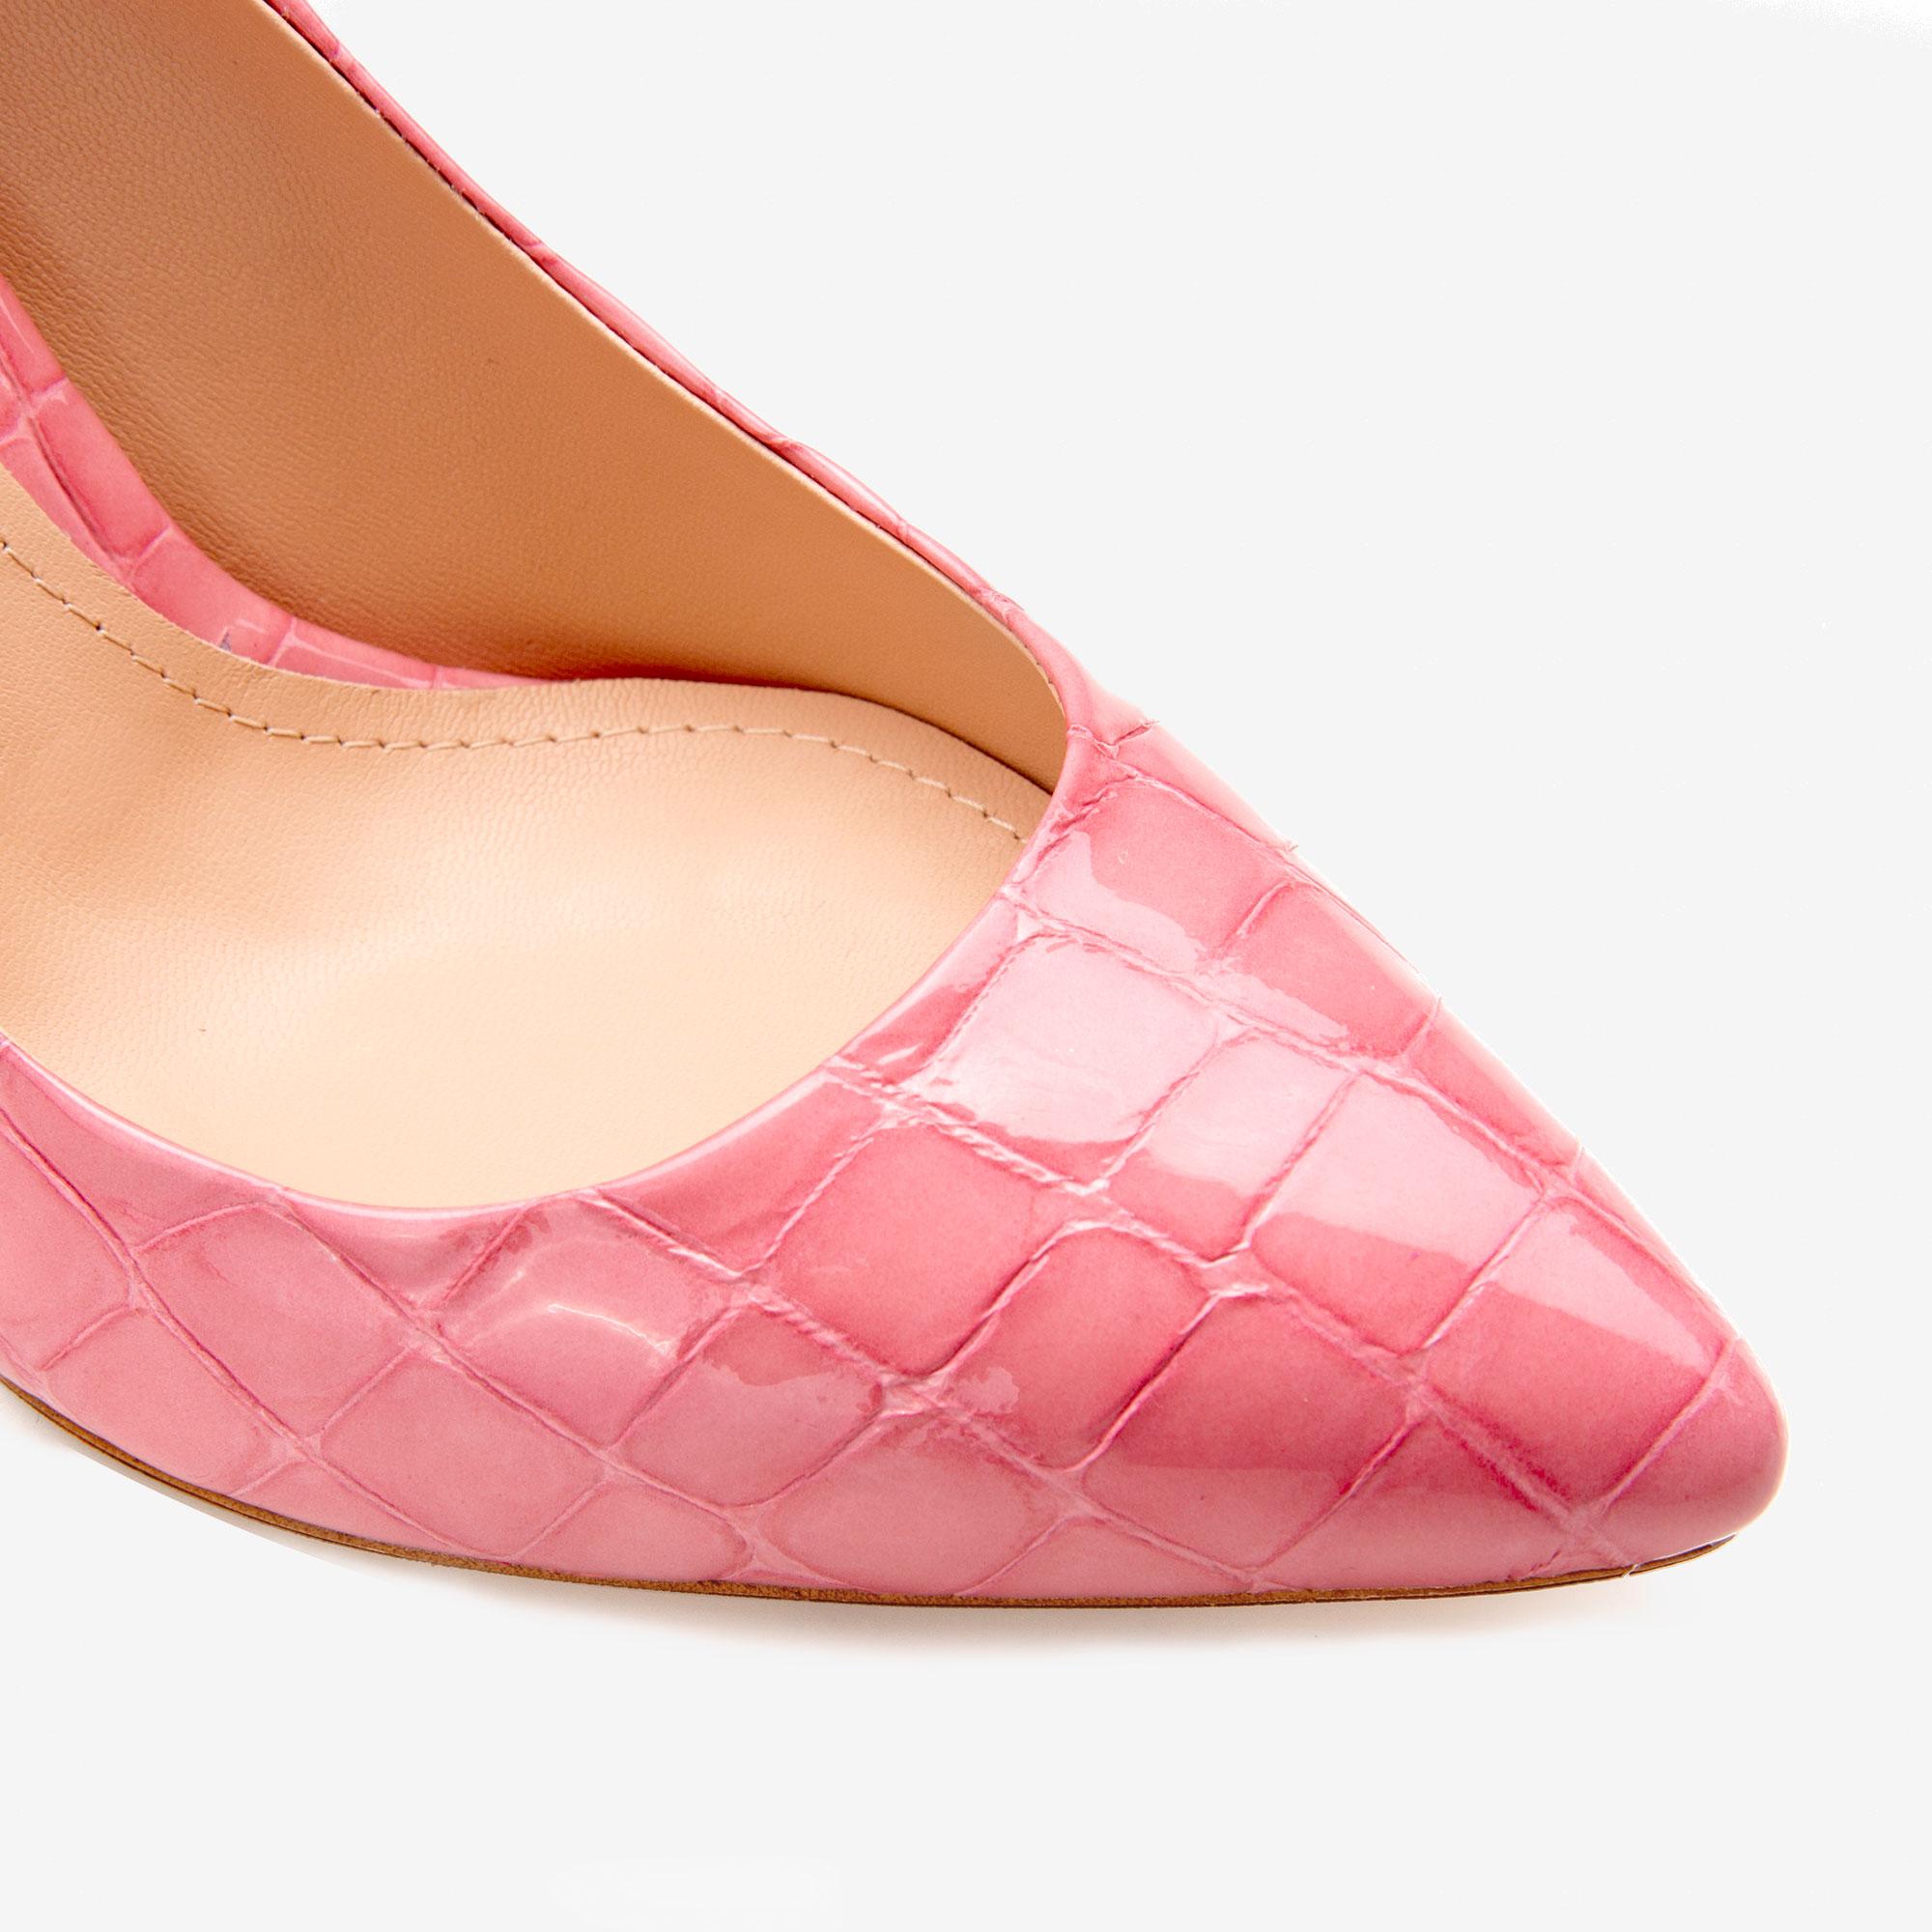 Pantofi cu varf ascutit din piele croco roz Ginissima imagine 4